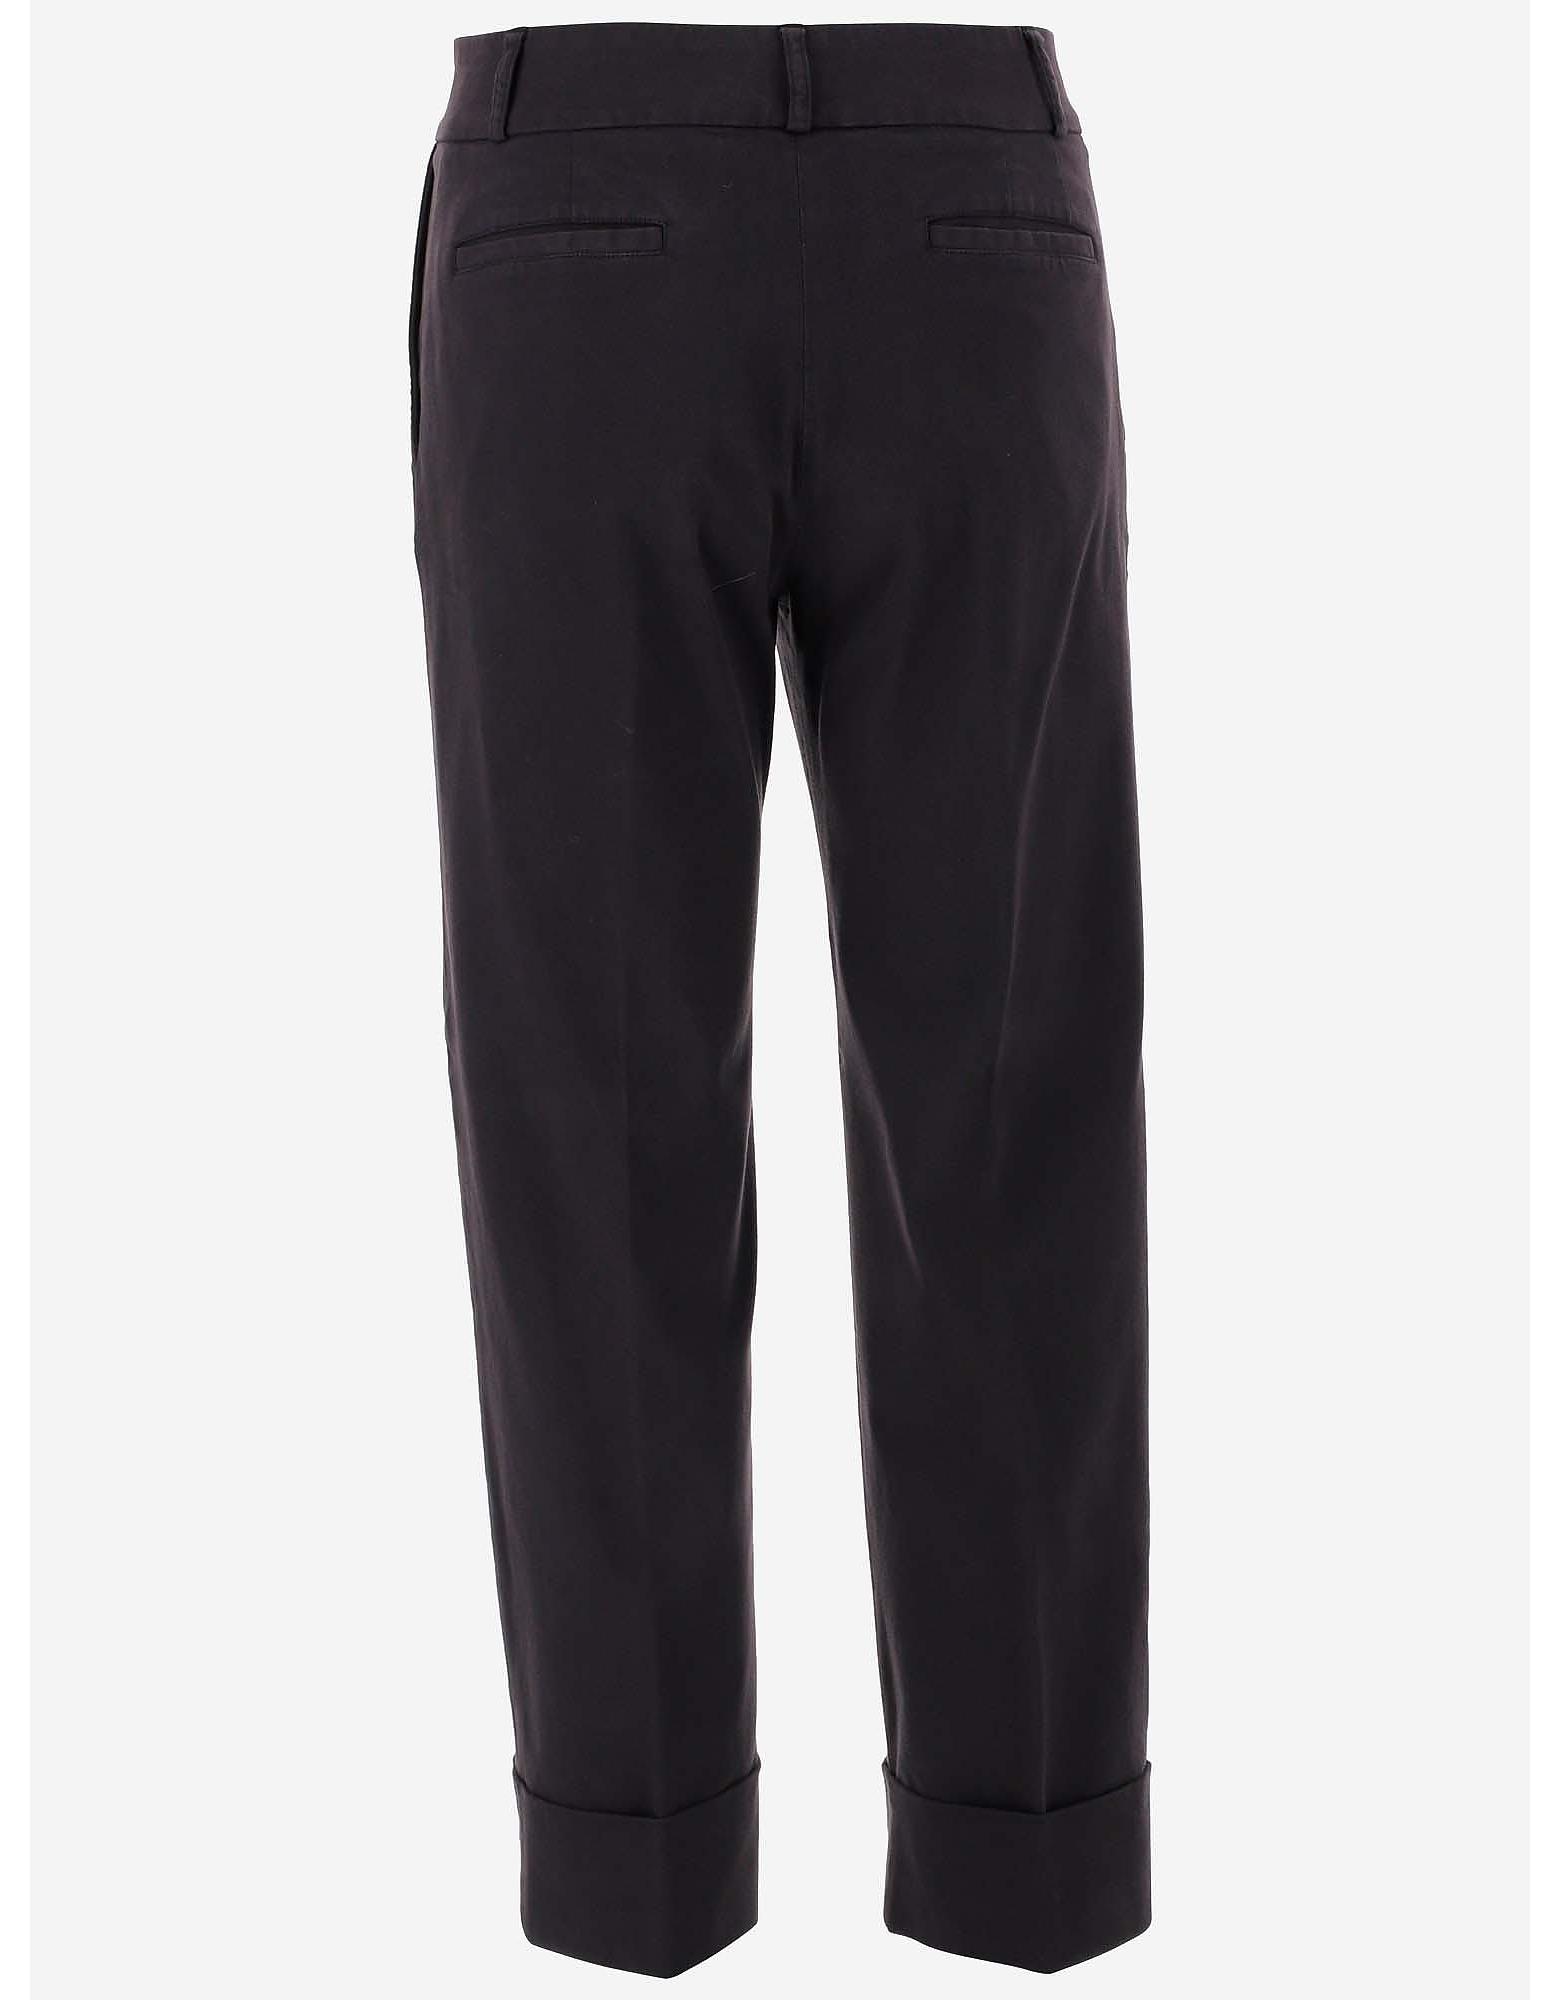 QL2 Donna Designer Pants, Women's Straight Pants